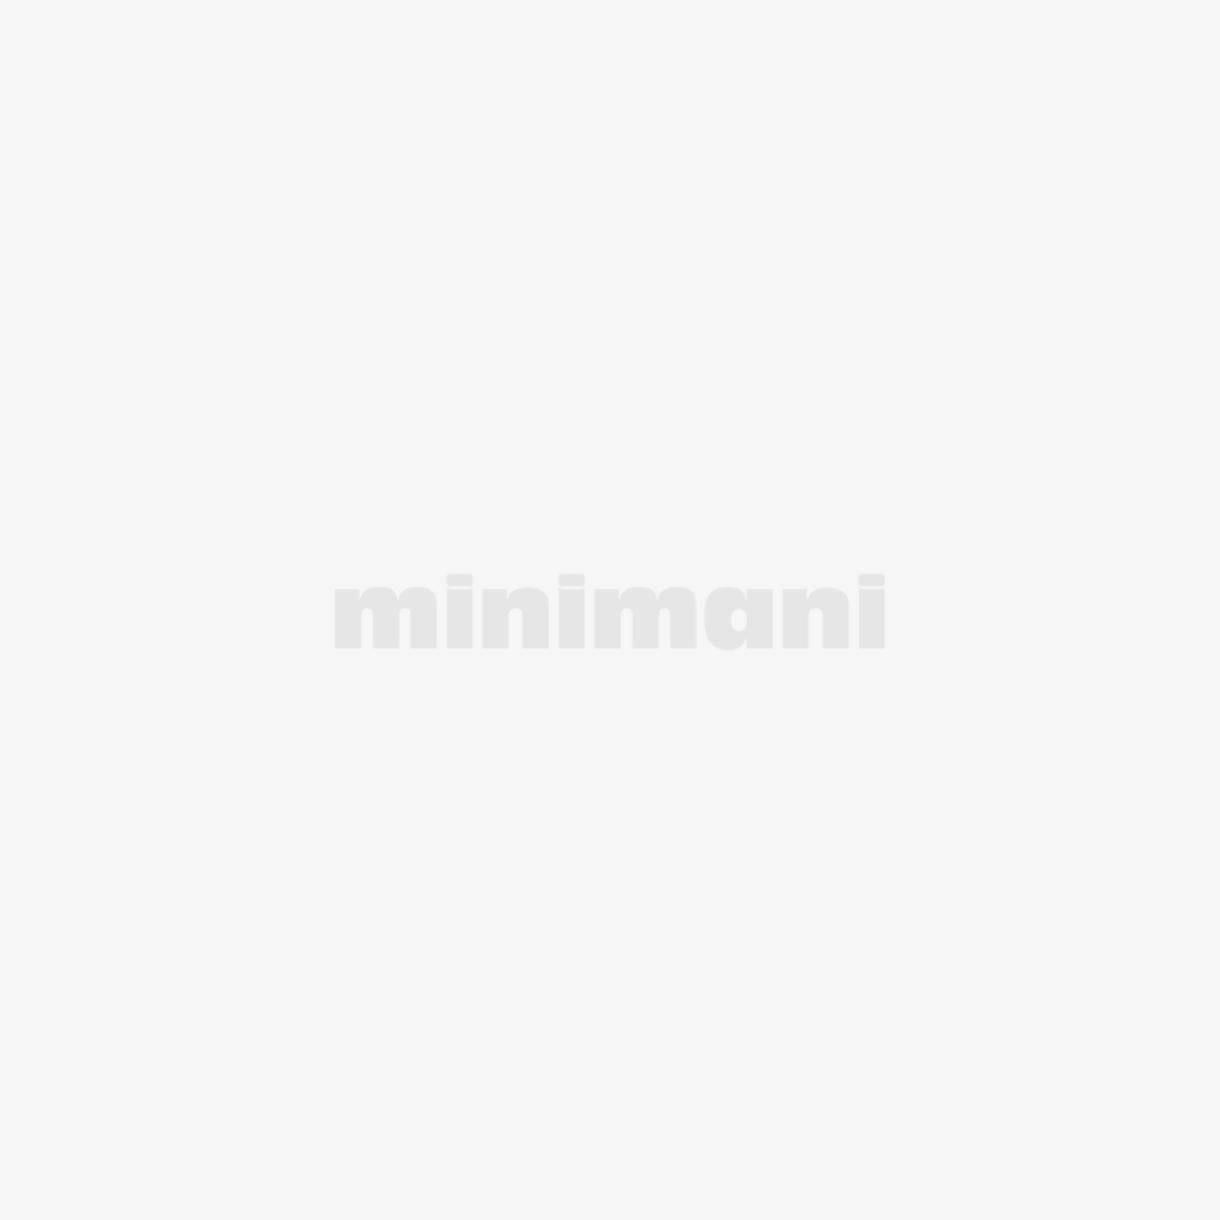 Vallila matto 80x230 cm, India harmaa